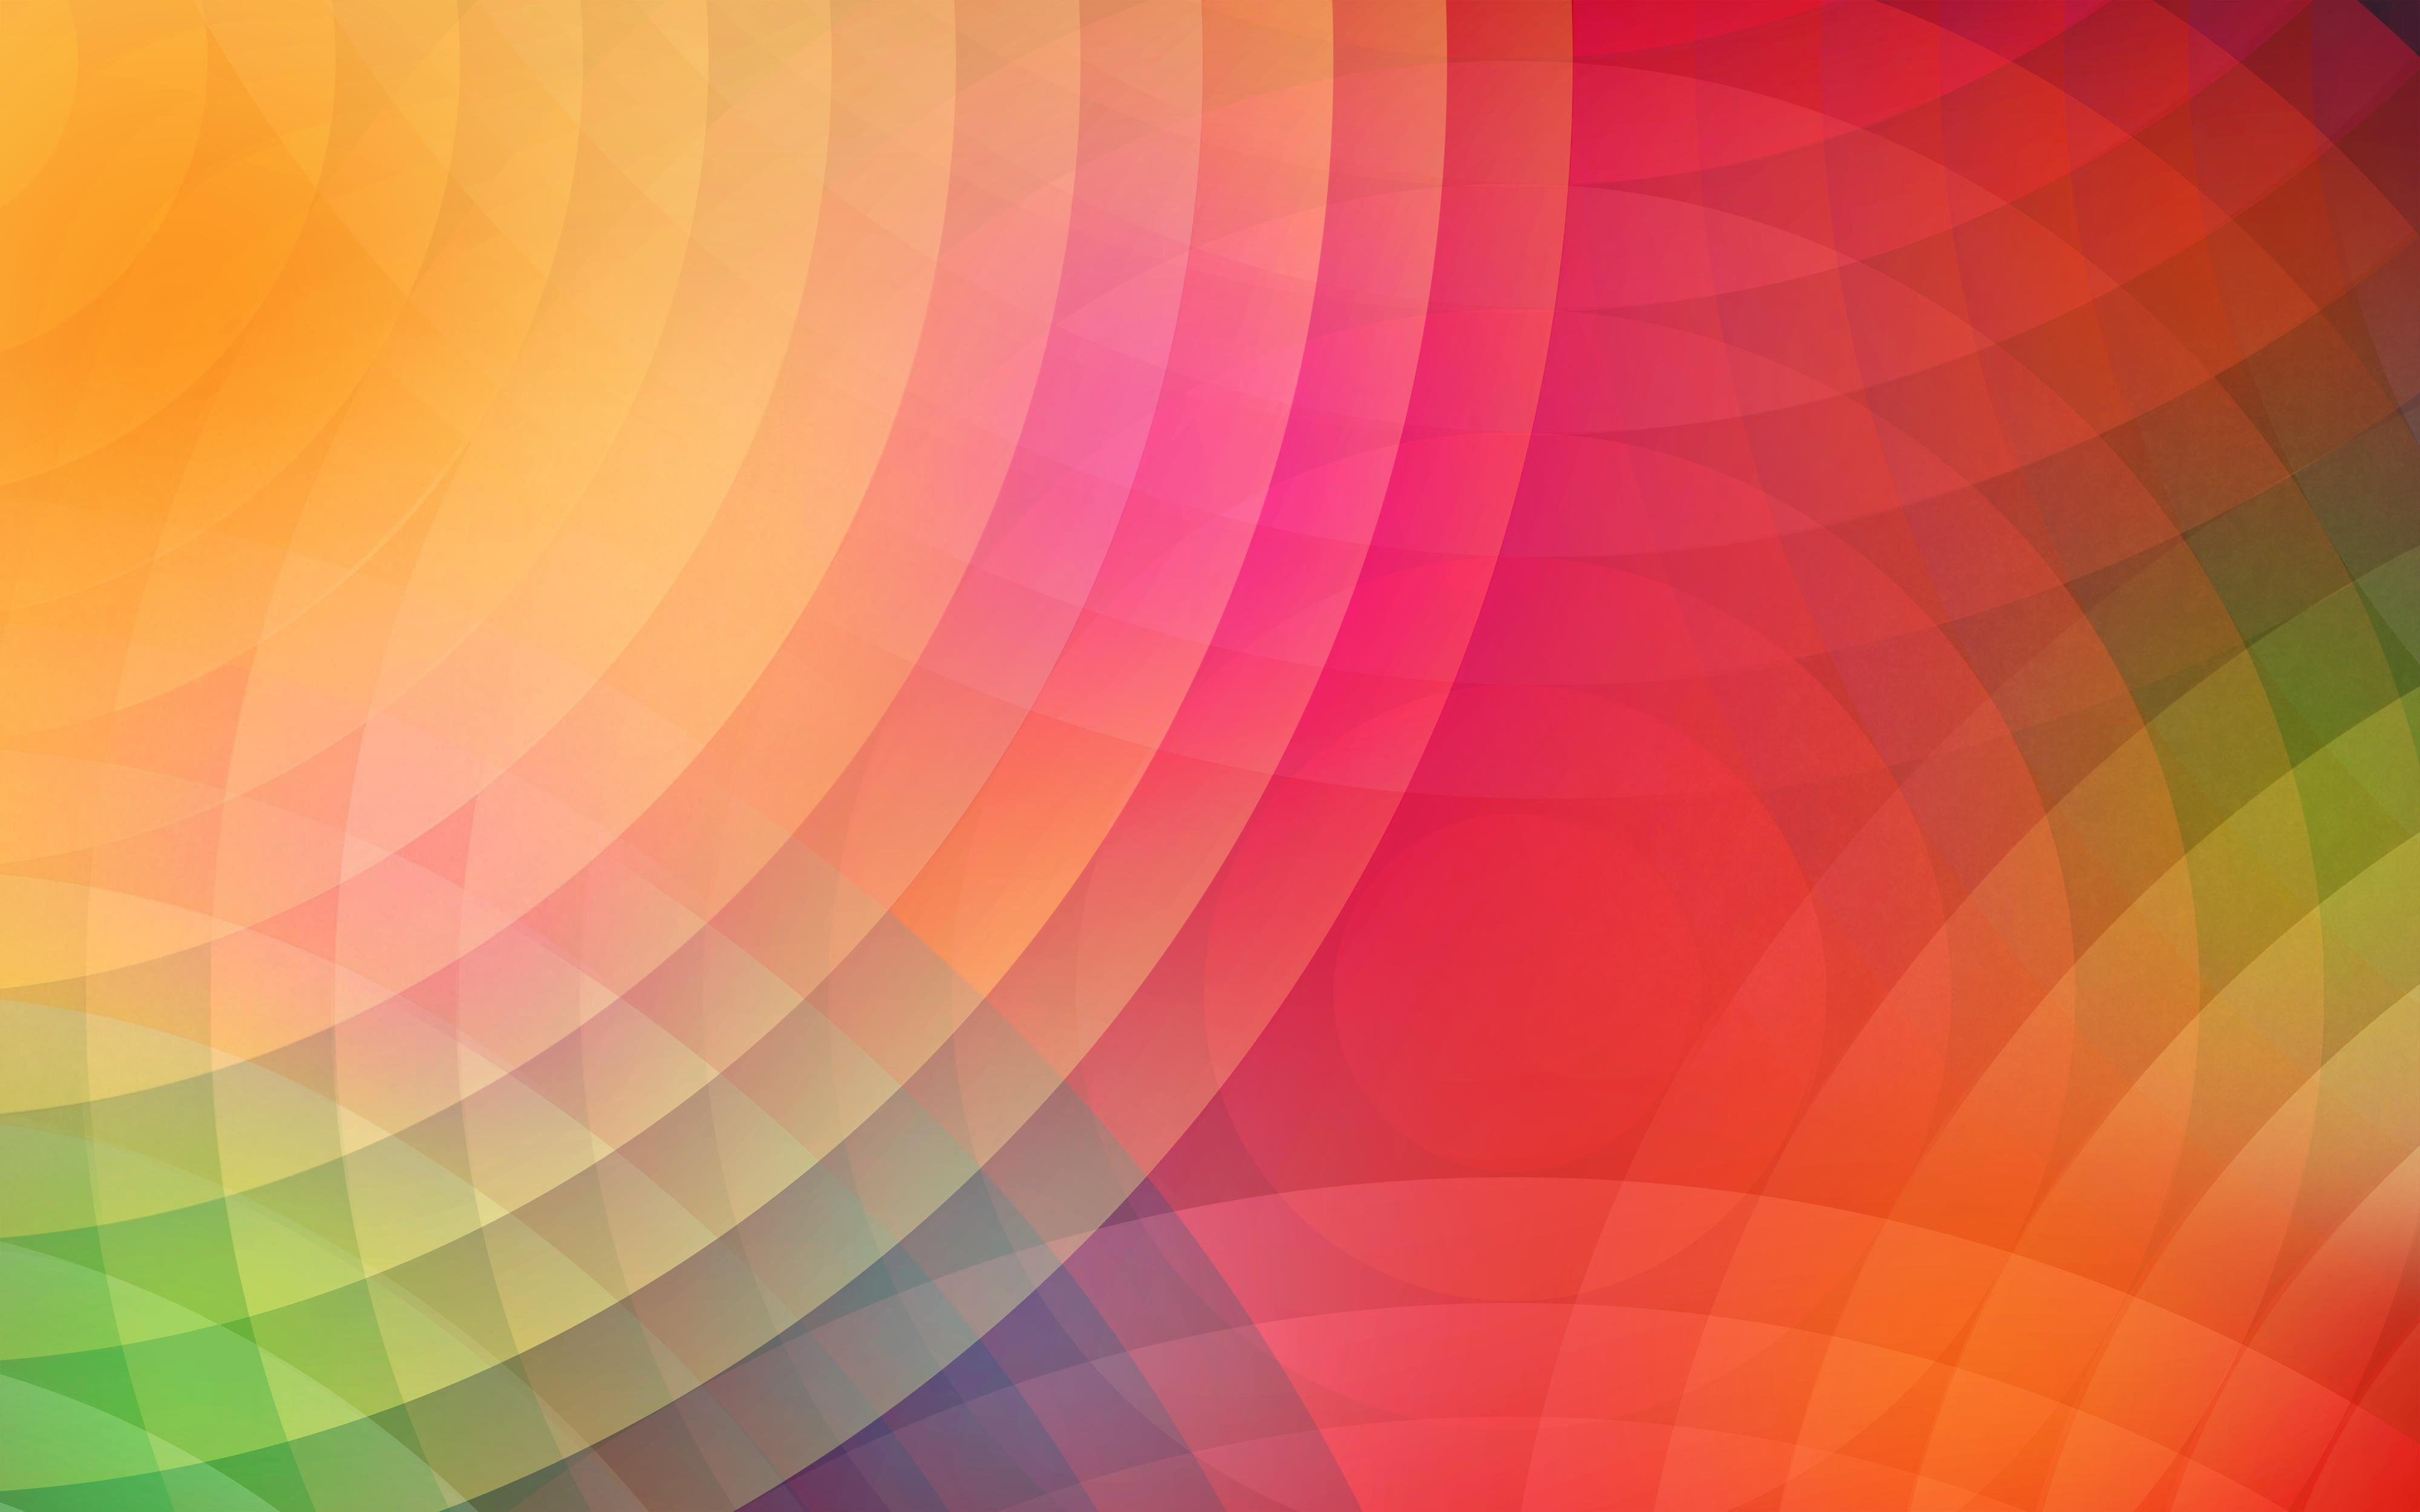 nexus wallpaper   SF Wallpaper 4000x2500